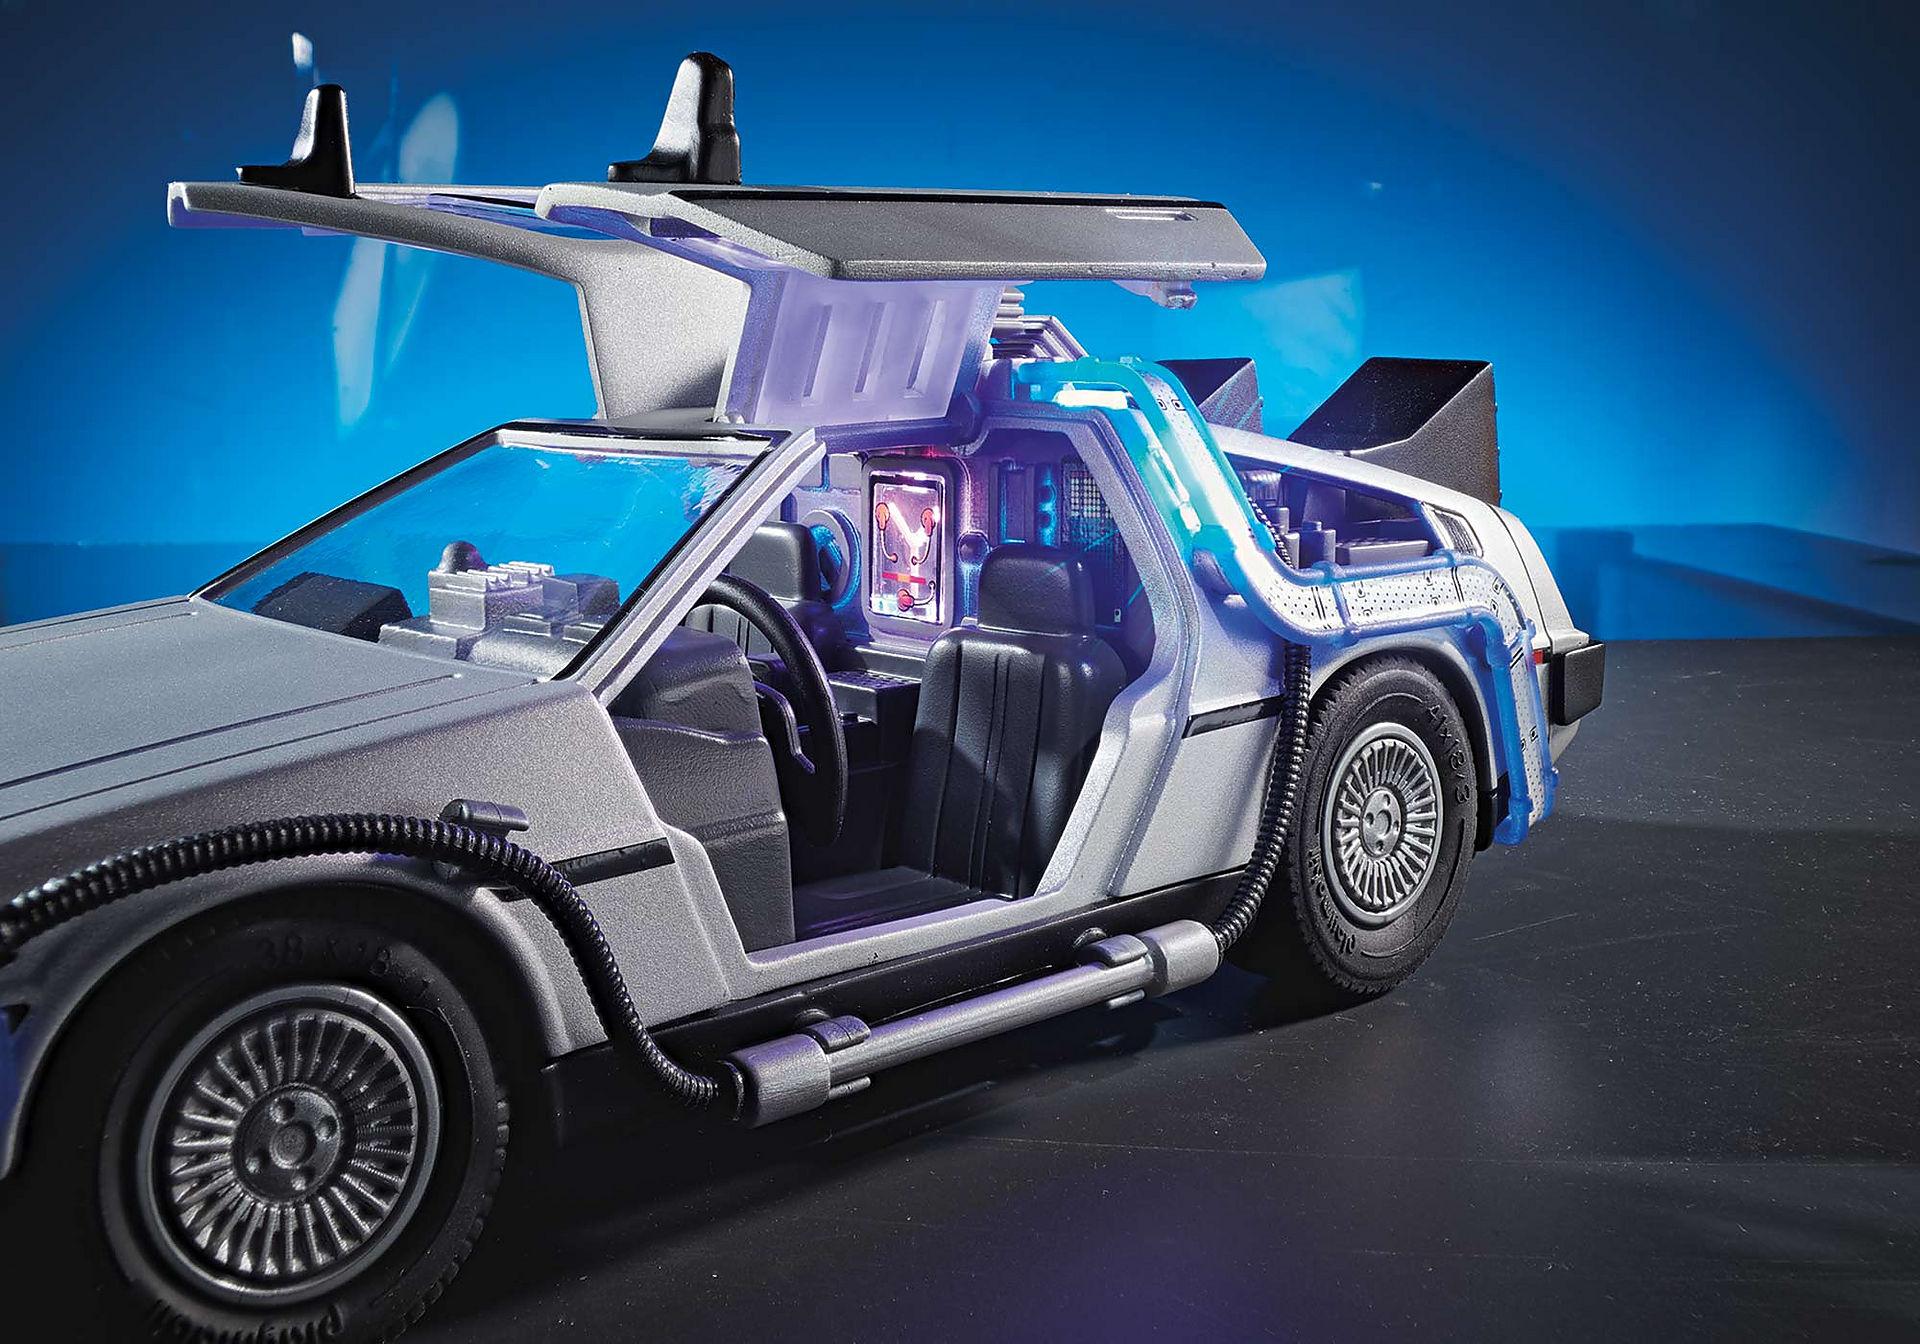 70317 Back to the Future Συλλεκτικό όχημα Ντελόριαν zoom image6